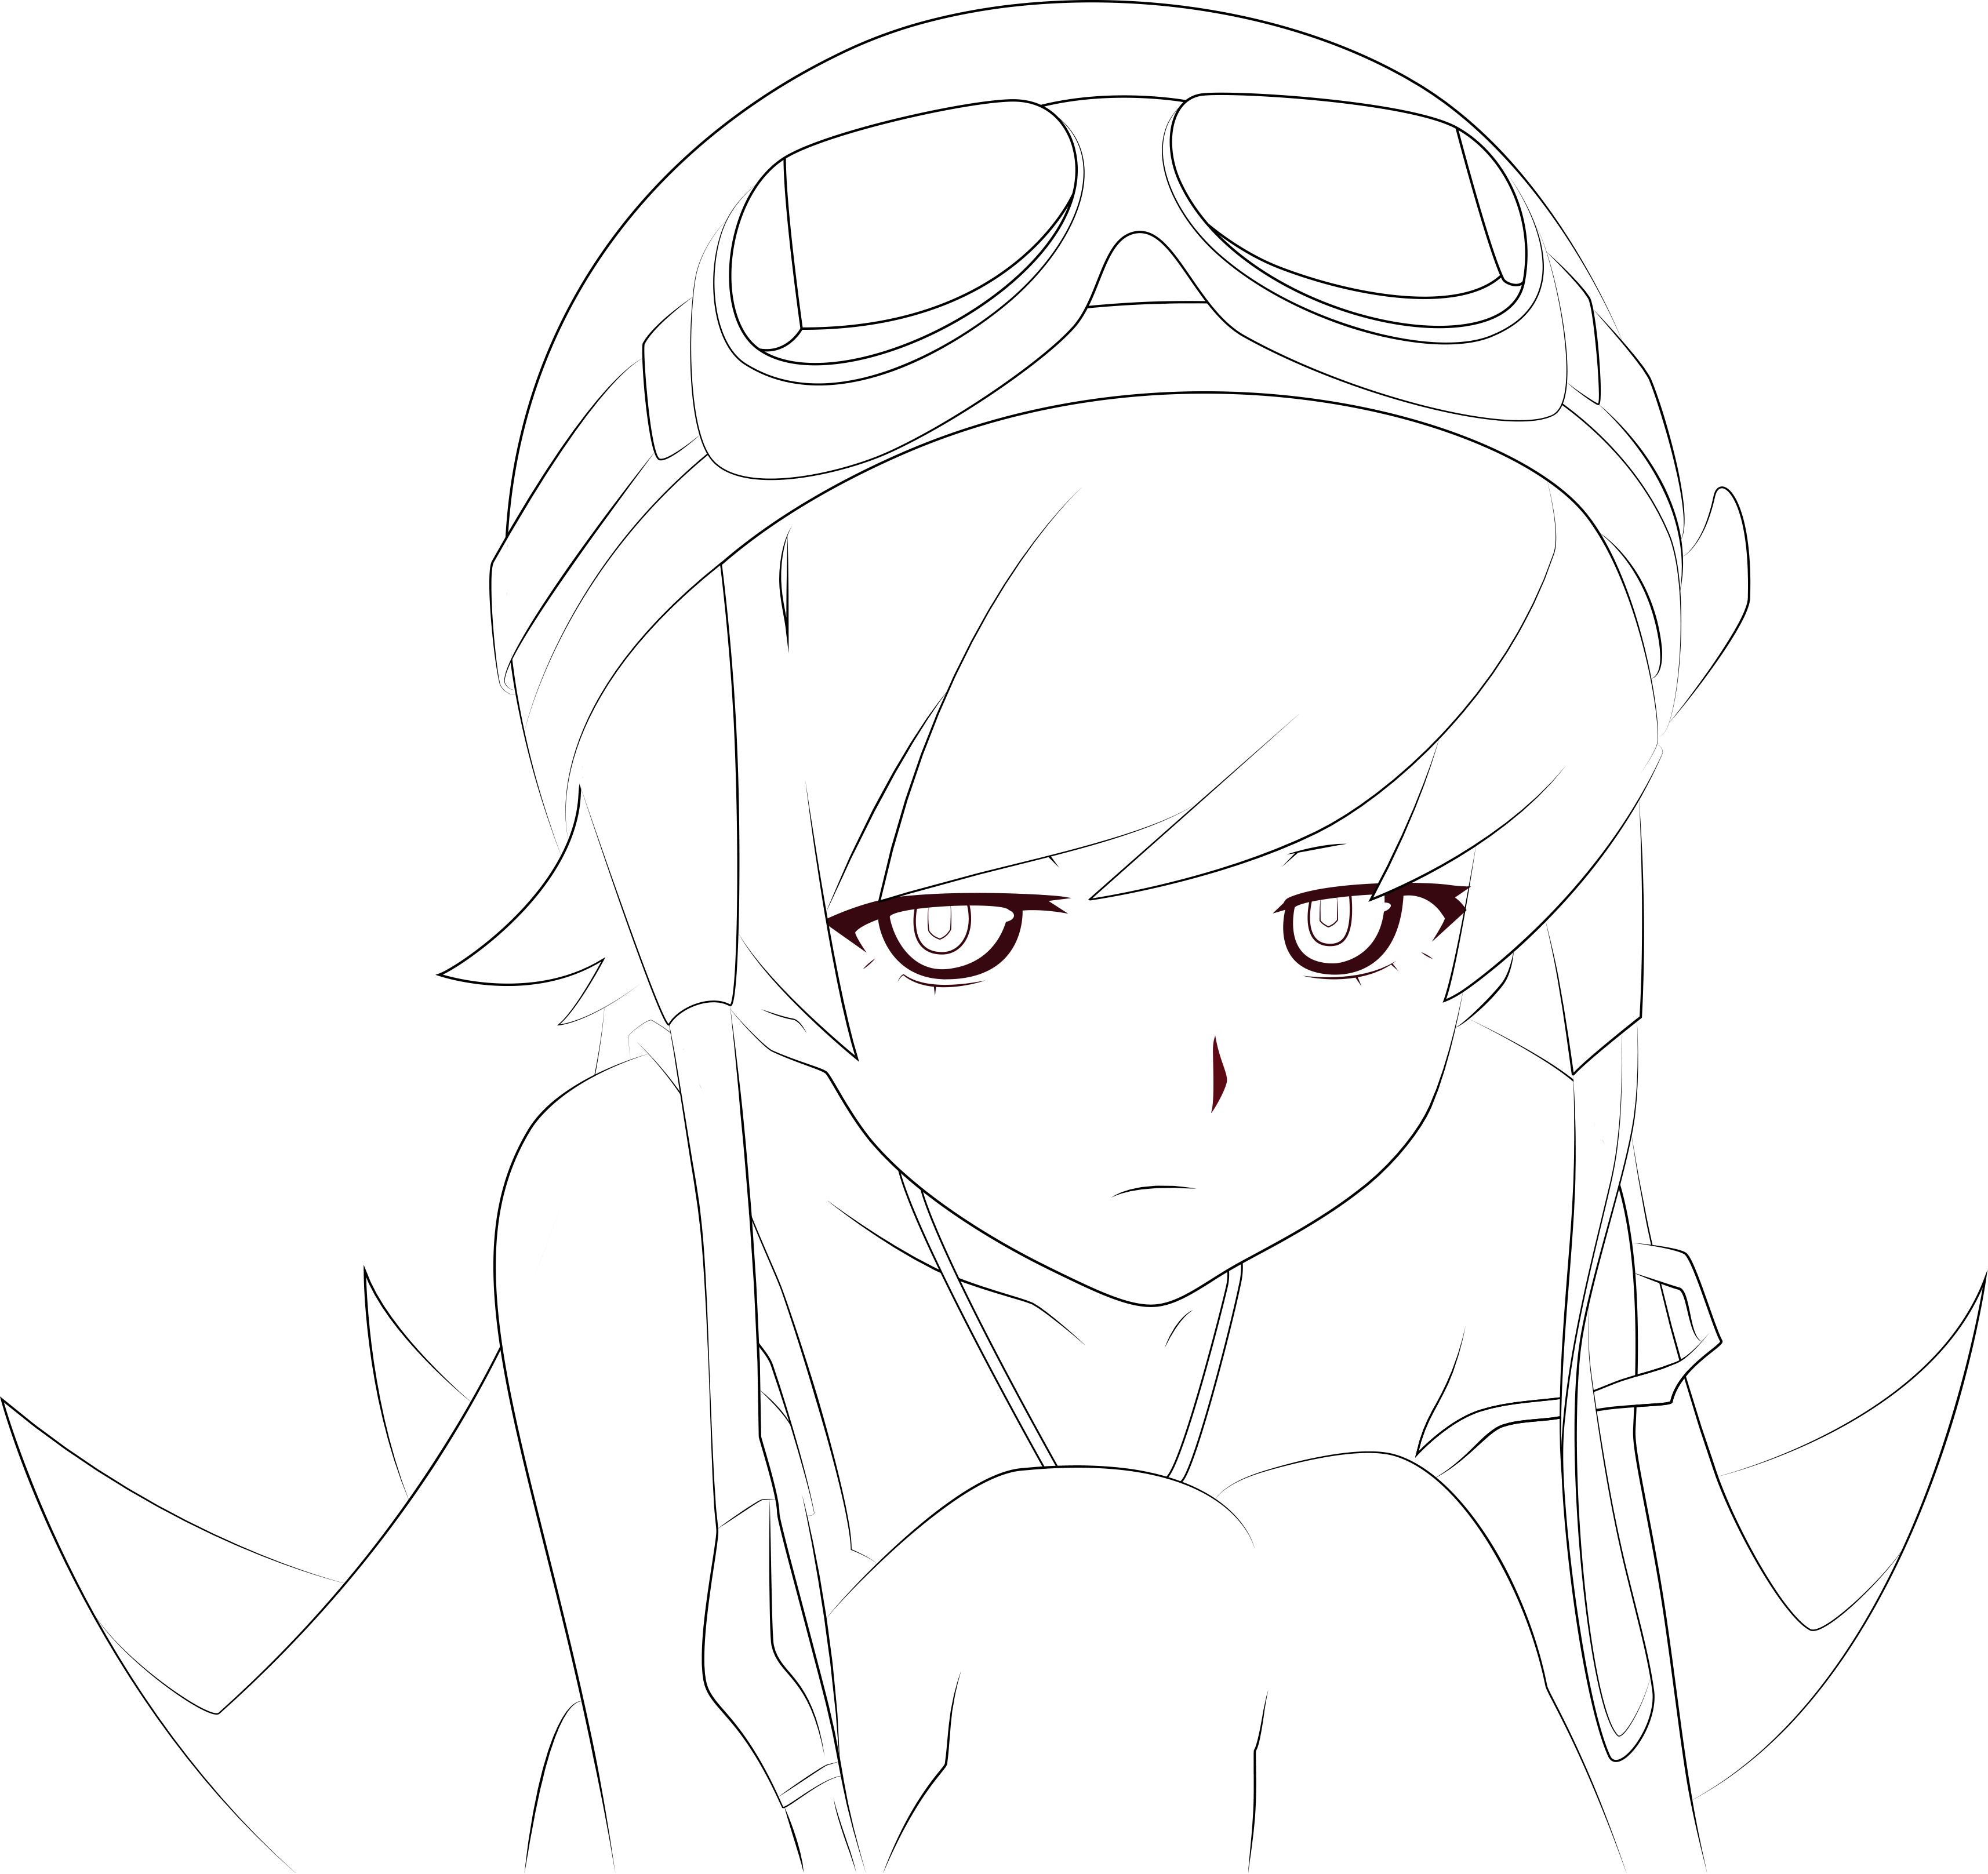 Bakemonogatari: Shinobu Vector Outline By YuukiON On